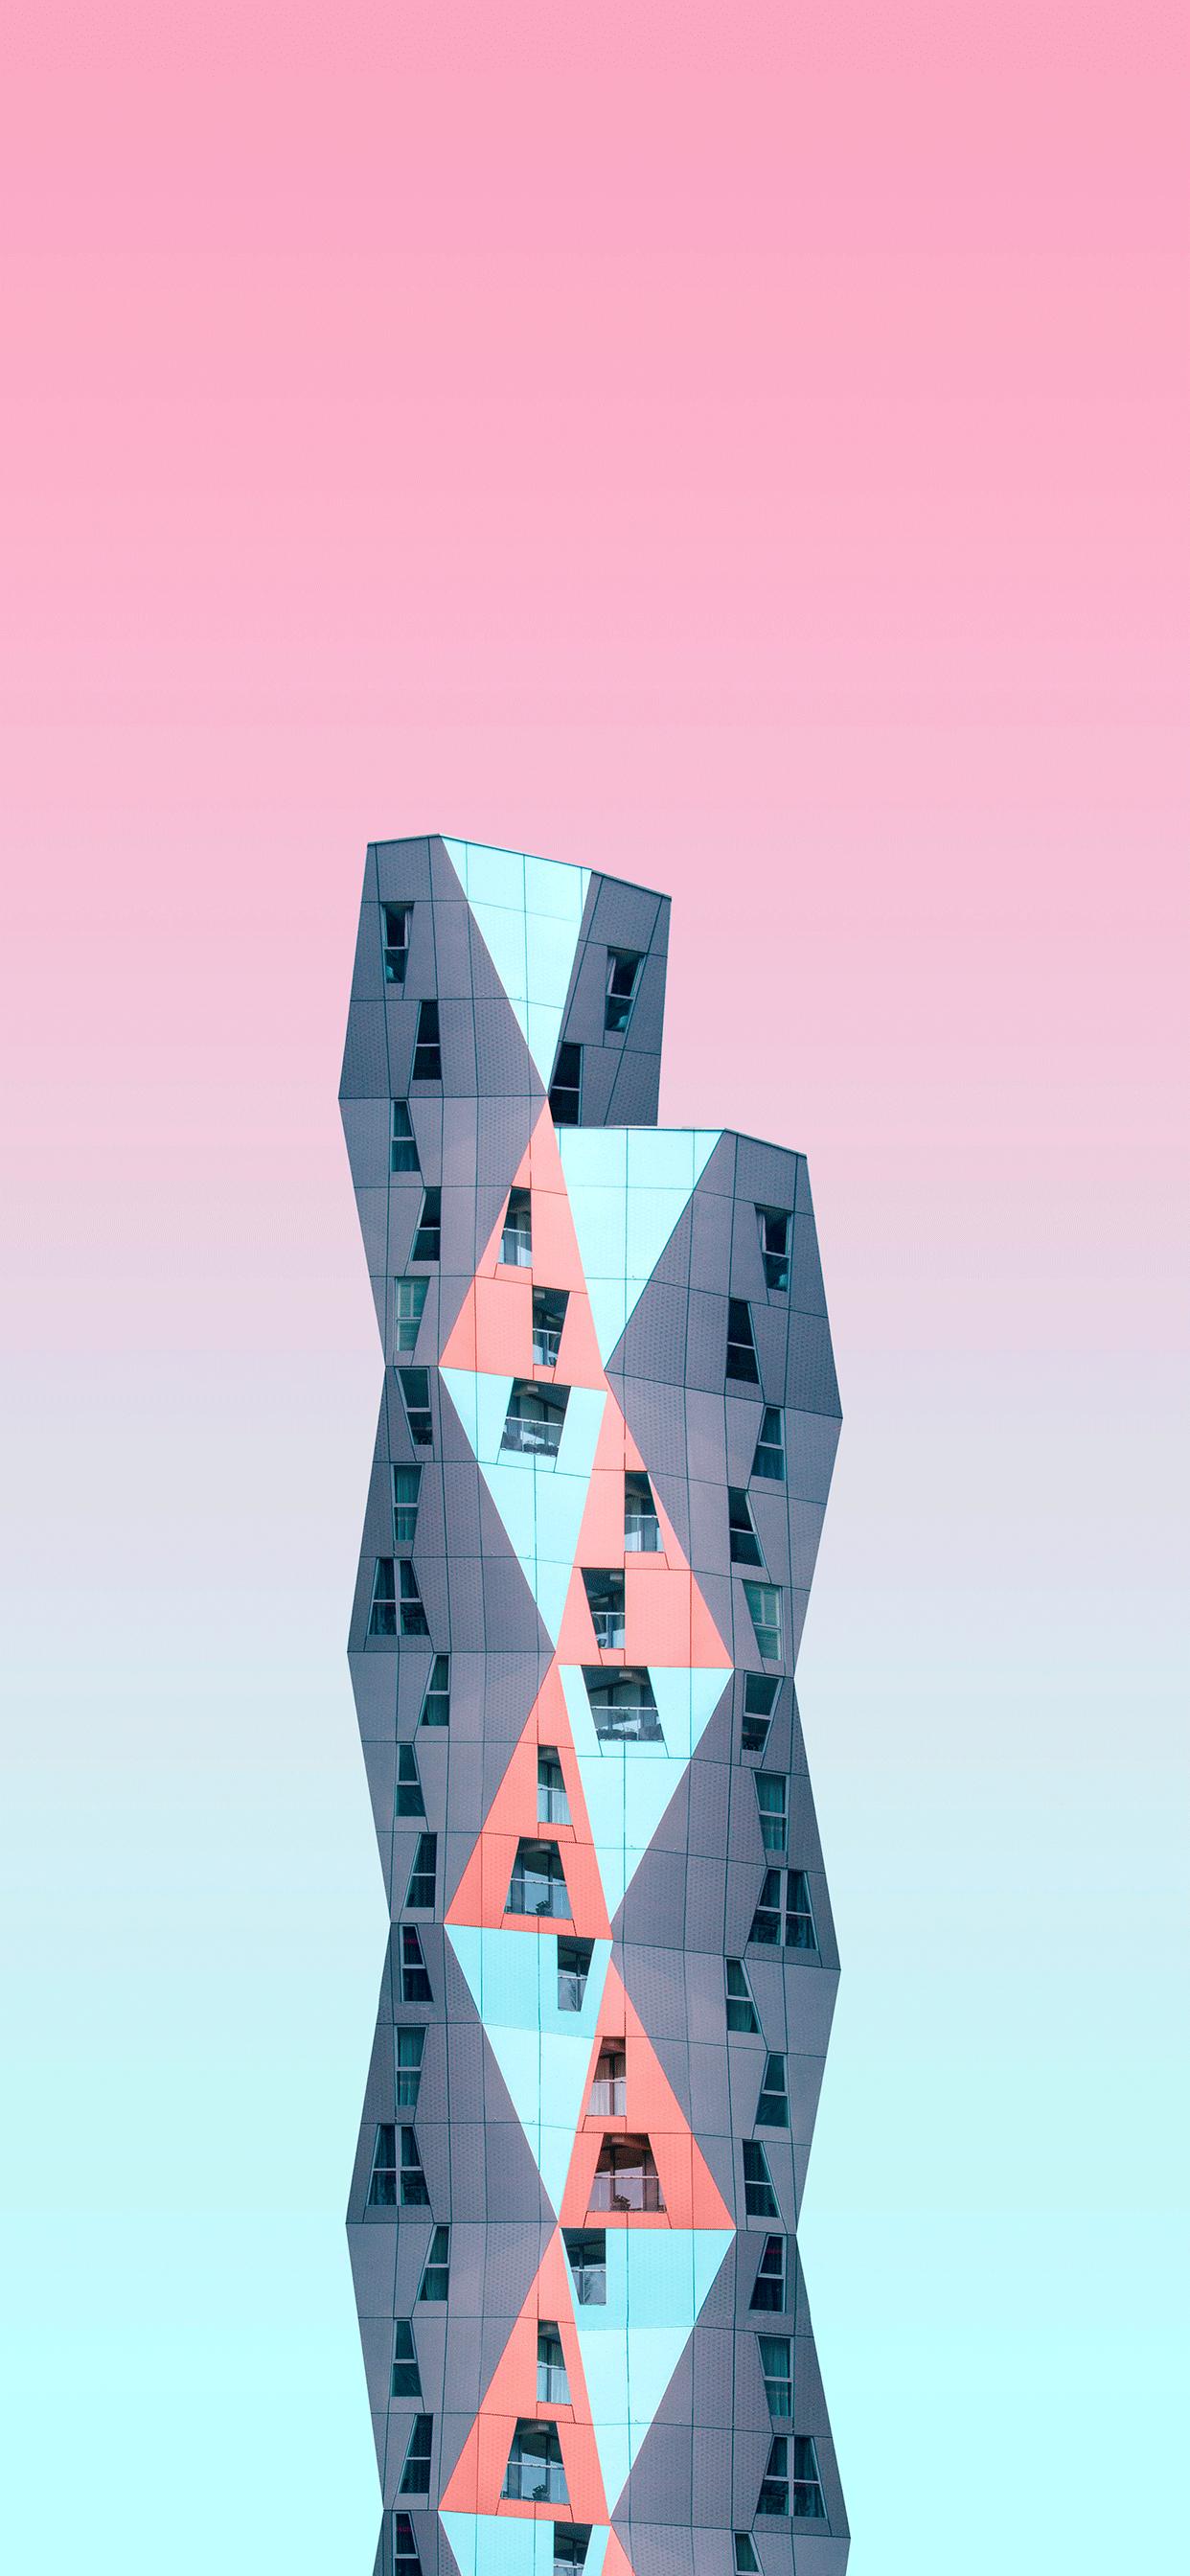 iPhone wallpaper architecture rotterdam Architecture